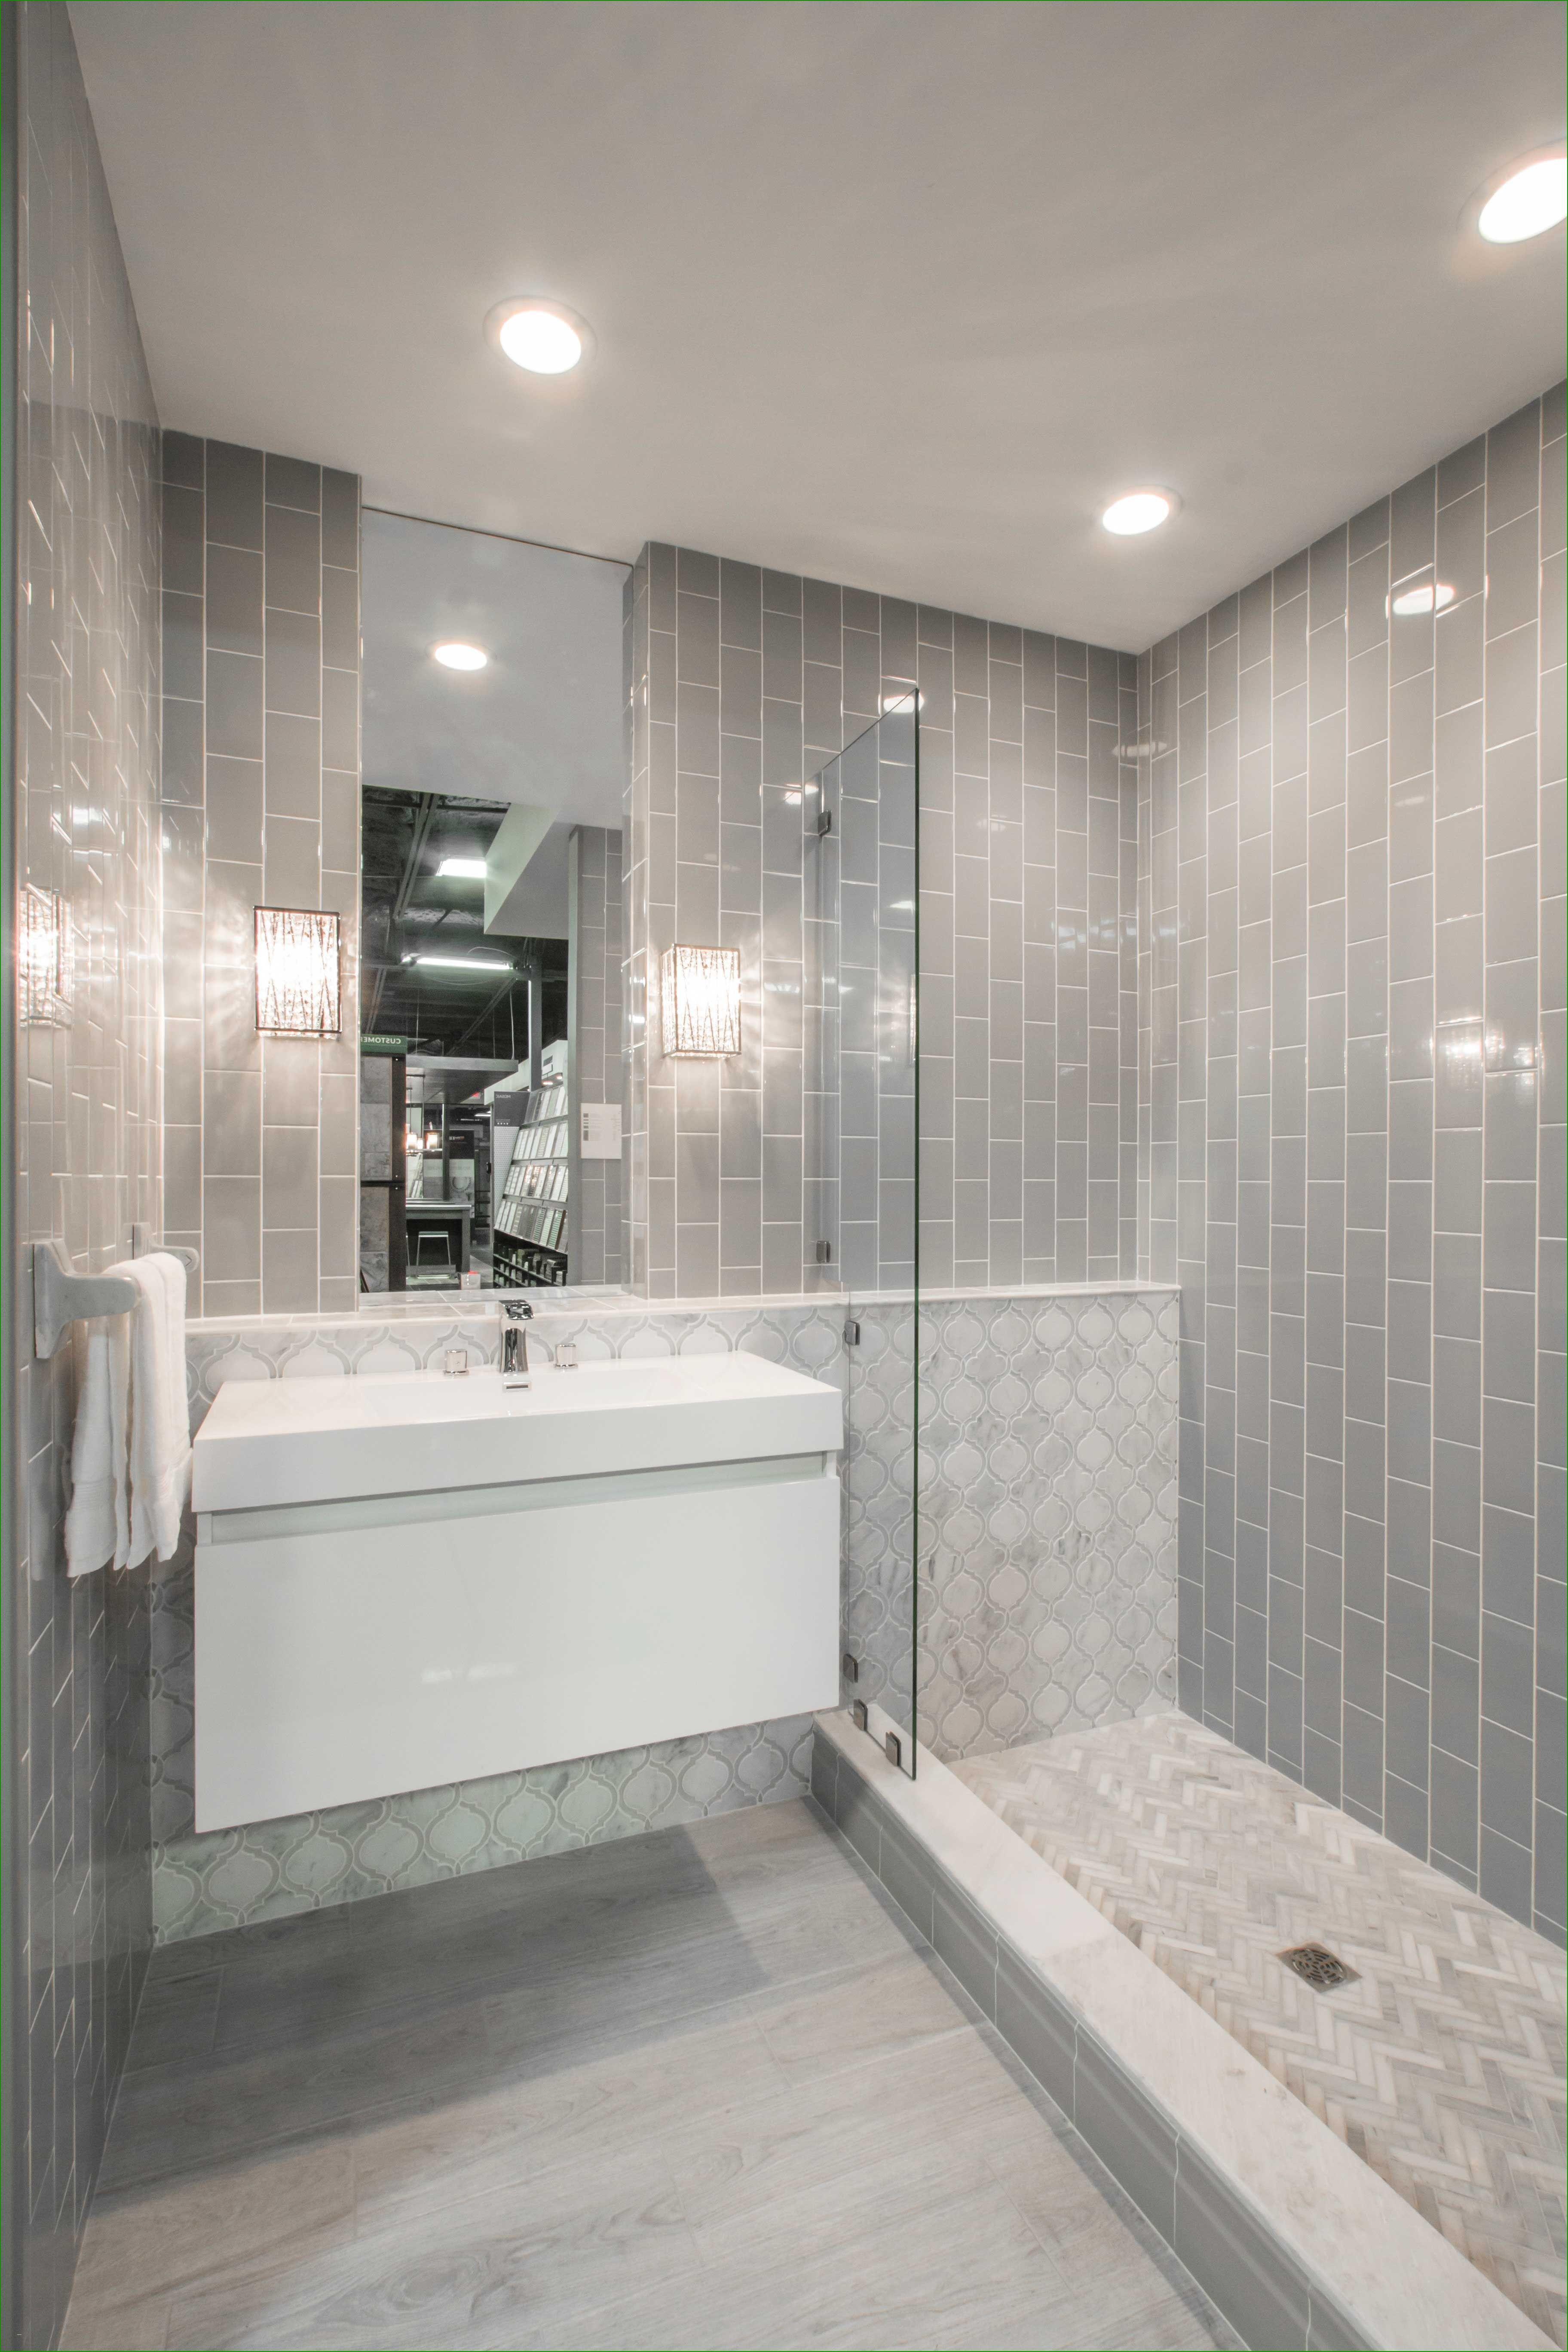 toilet wallpaper hd unique perfect bathroom ideas small